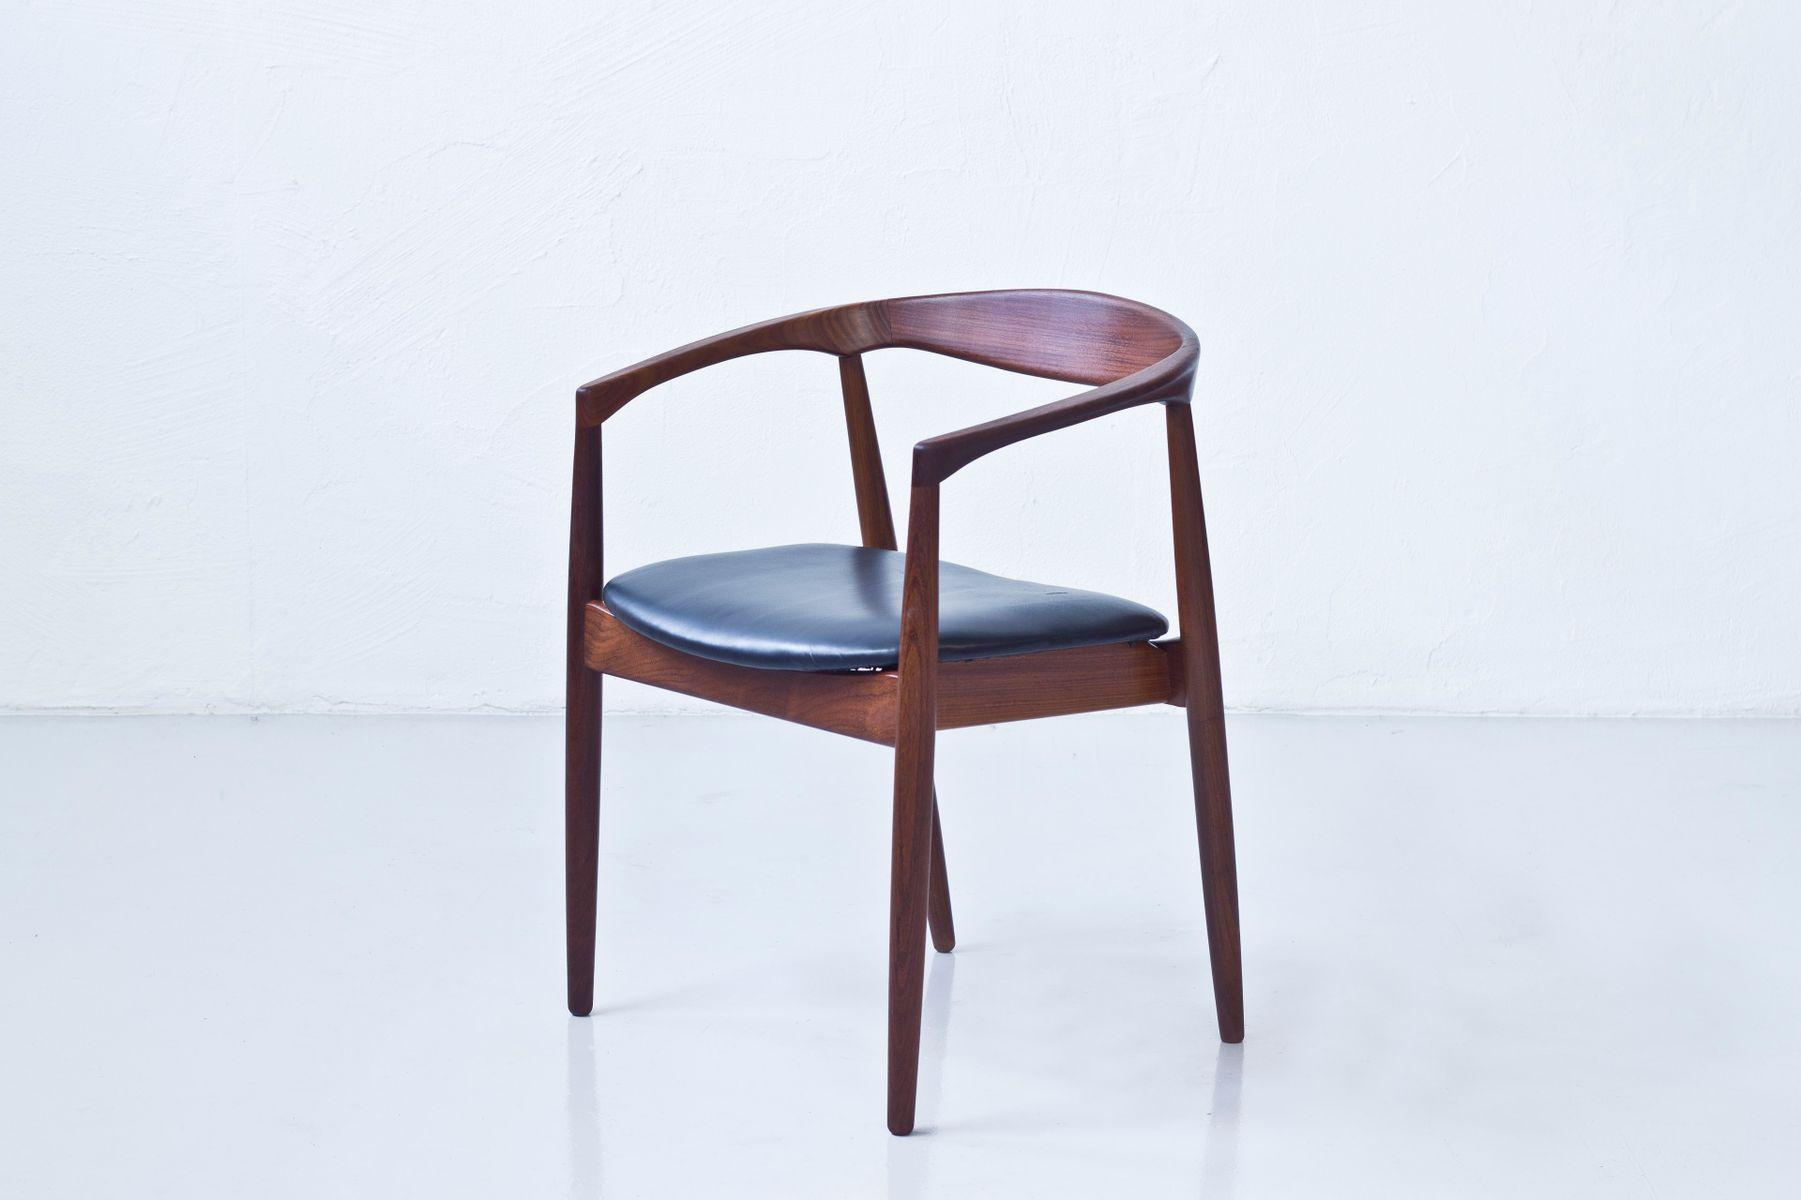 Troika Arm Chair by Kai Kristiansen for Ikea 1950s for sale at Pamono